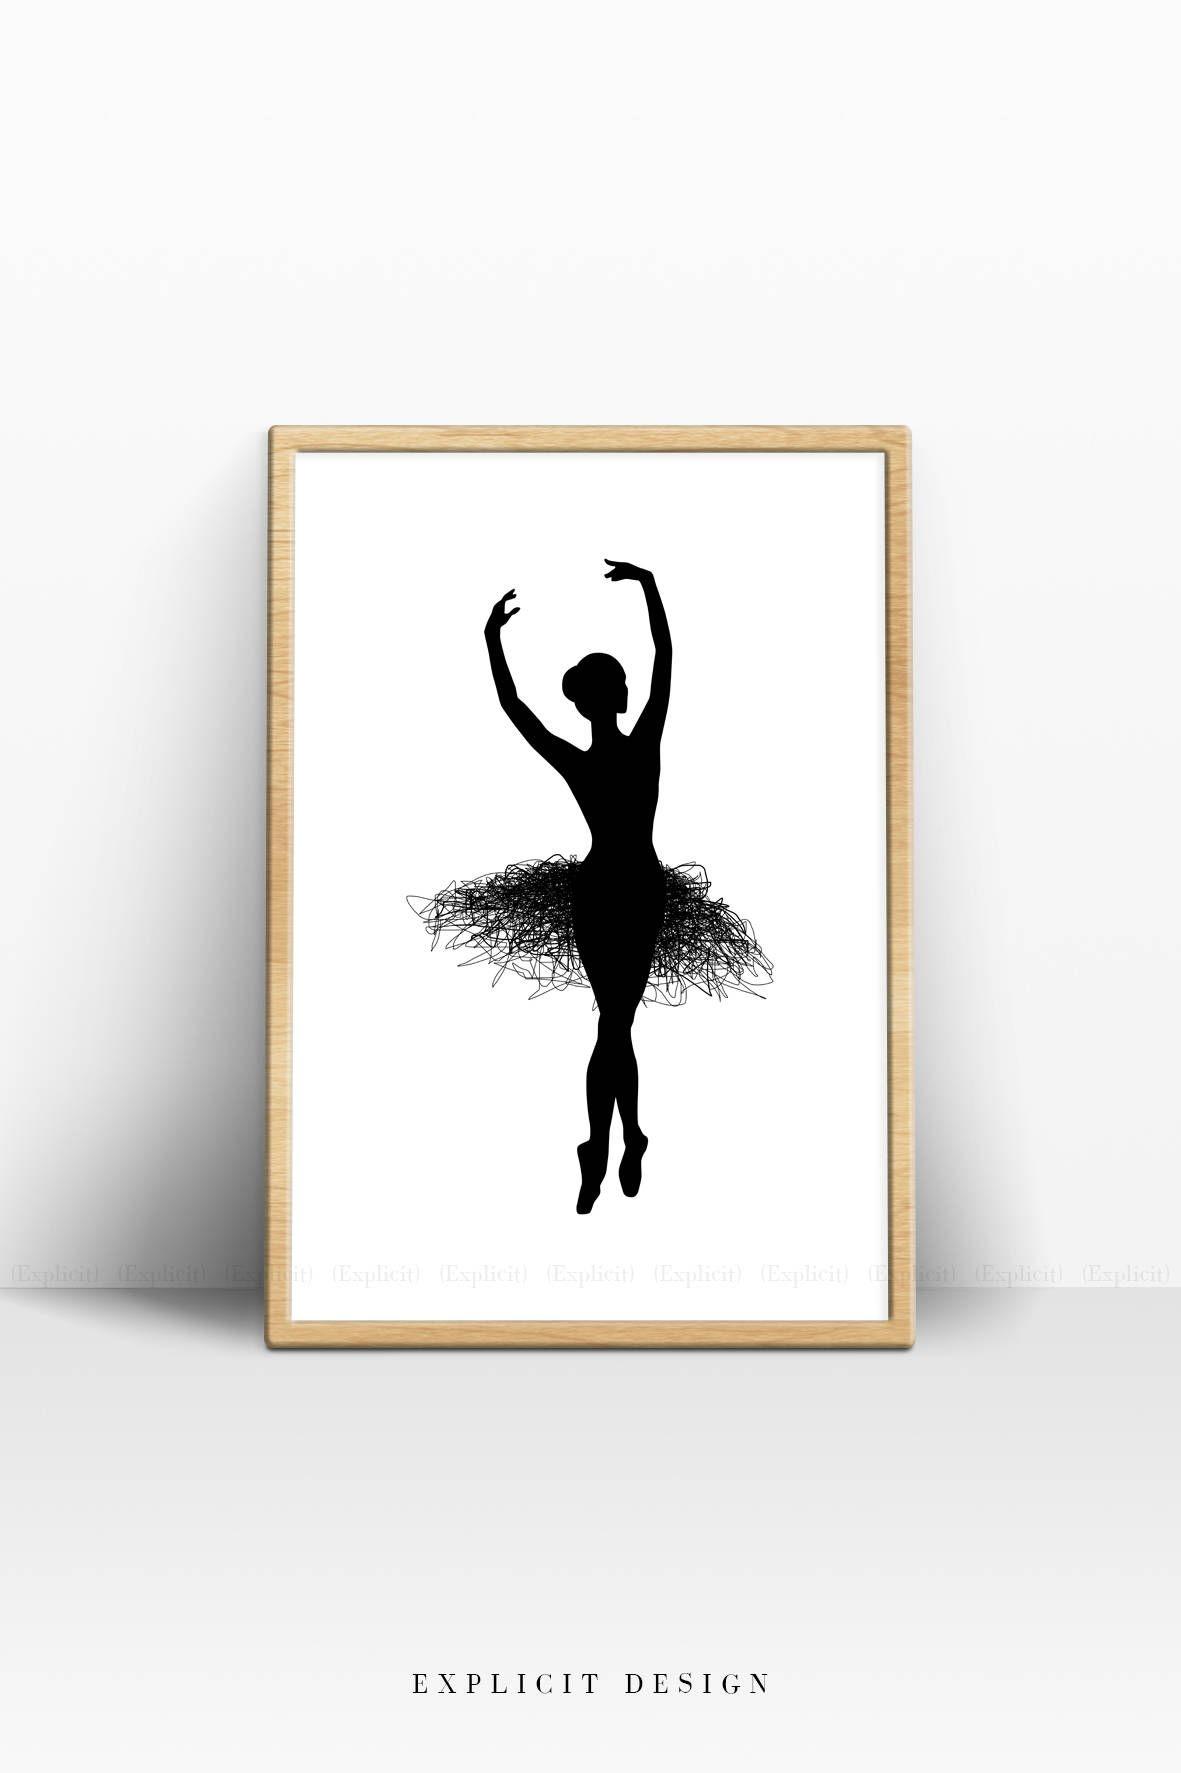 photo relating to Ballerina Silhouette Printable called Ballet Silhouette Print, Sophisticated Ballerina Prints, Black